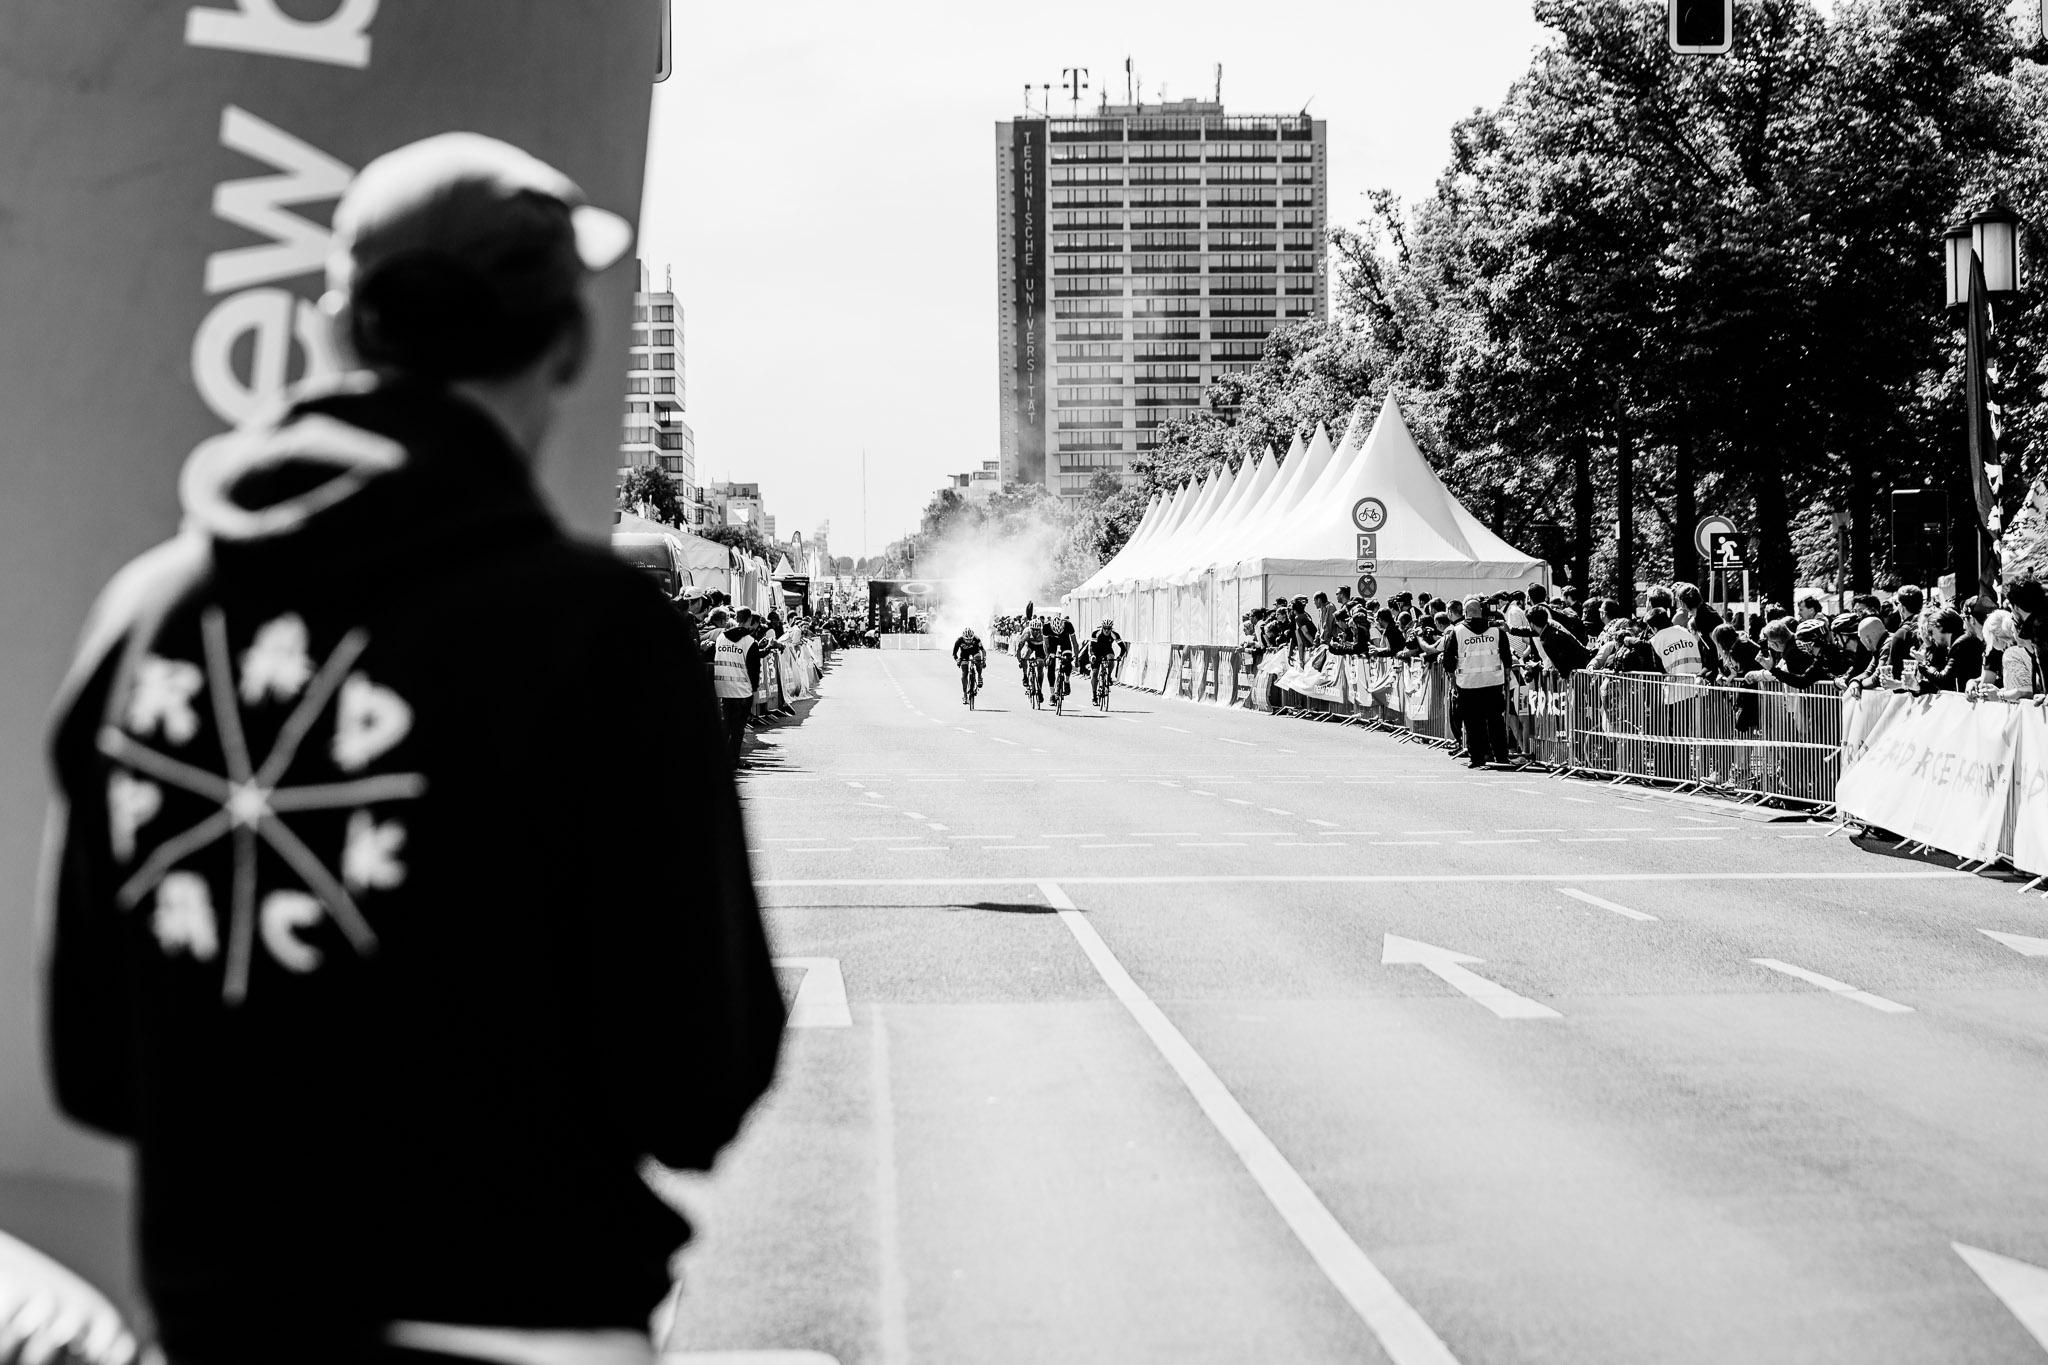 RAD RACE Battle, Berlin May 30 2015 Photo by Björn Lexius_09.jpg